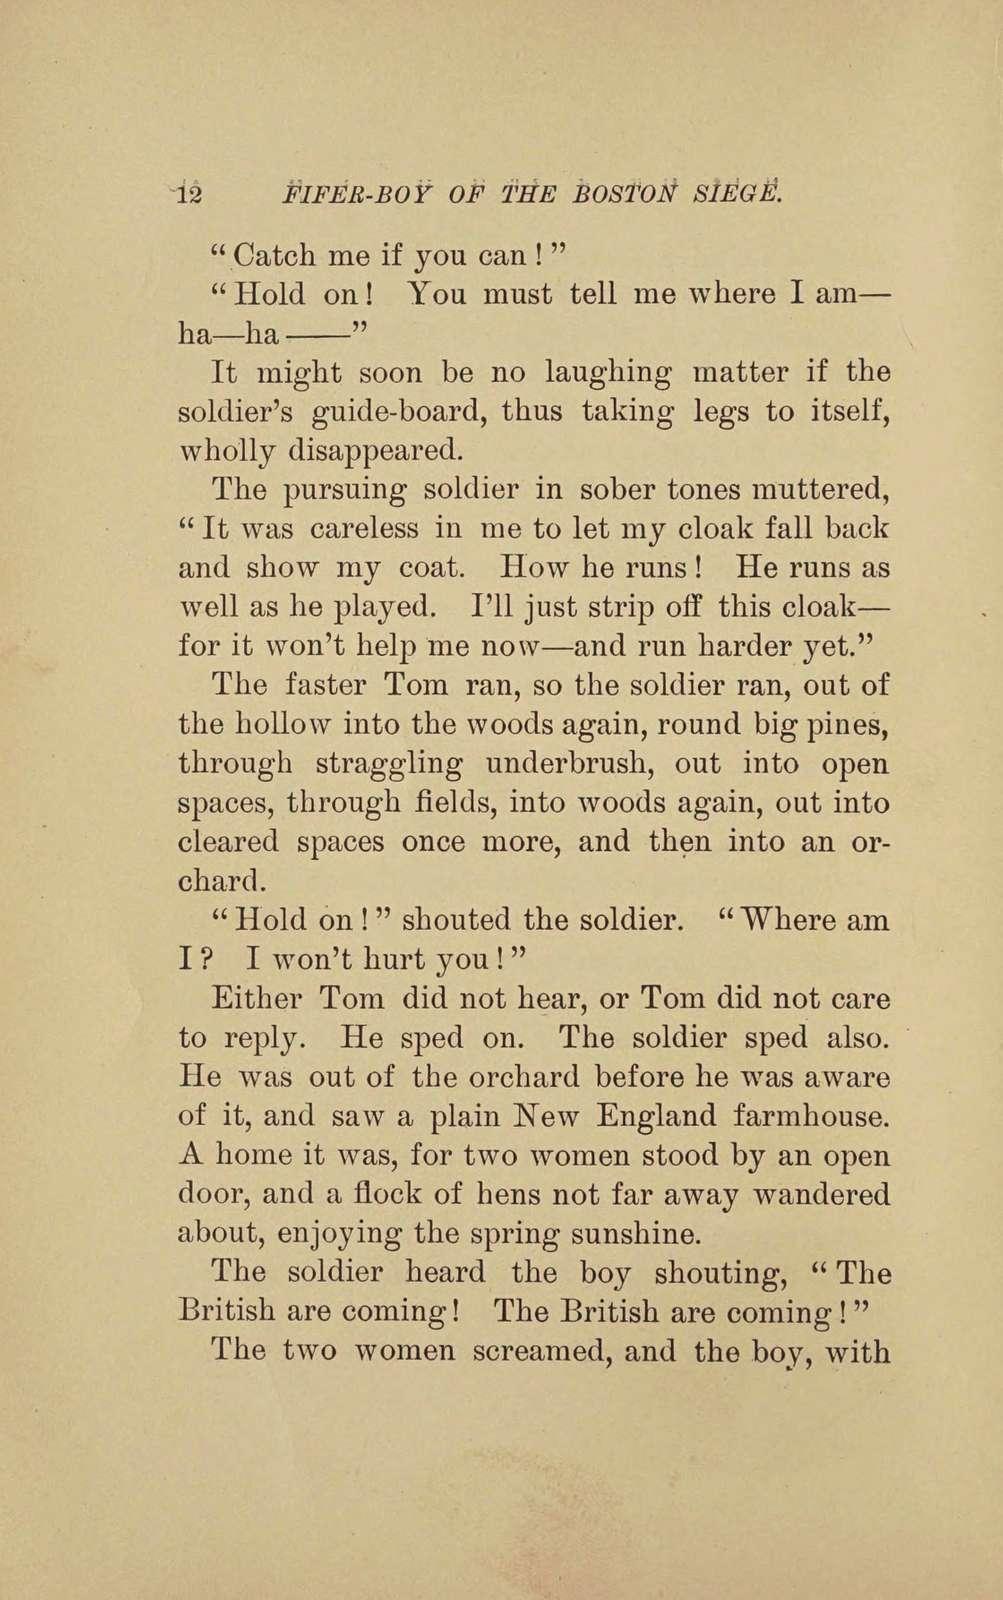 Fifer-boy of the Boston siege,